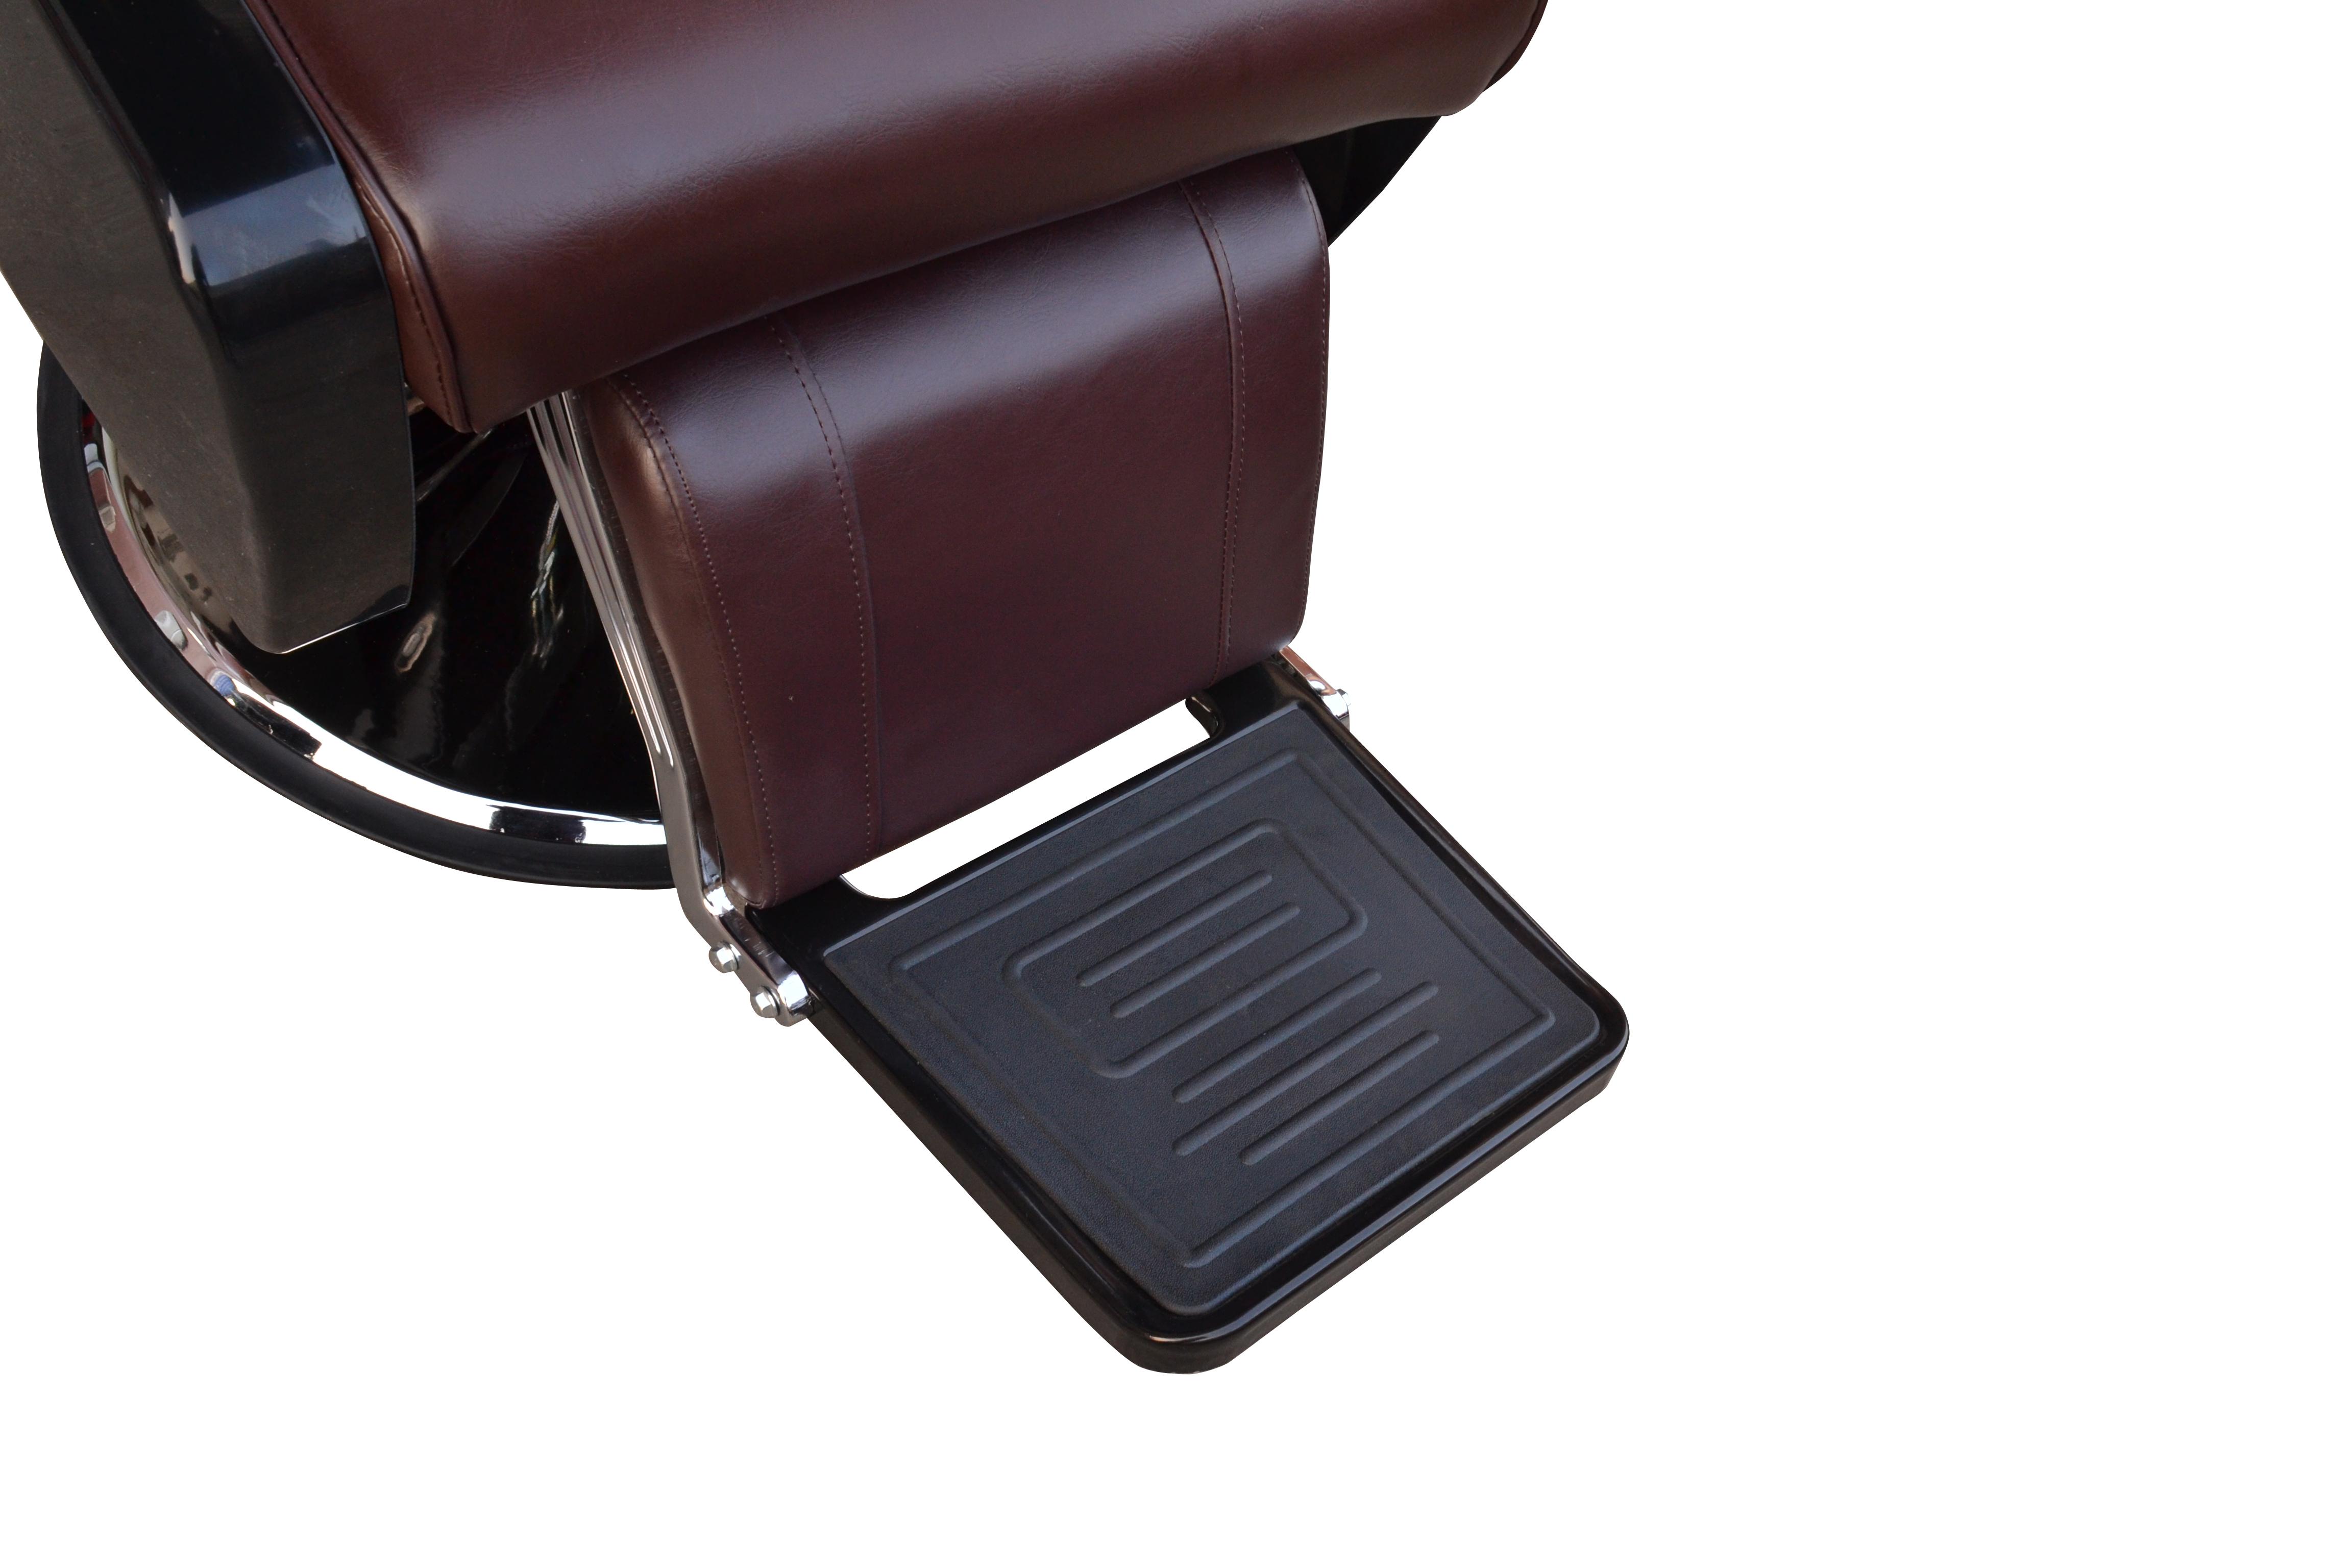 BarberPub All Purpose Hydraulic Recline Barber Chair Salon Beauty Spa 8702 Brown 16